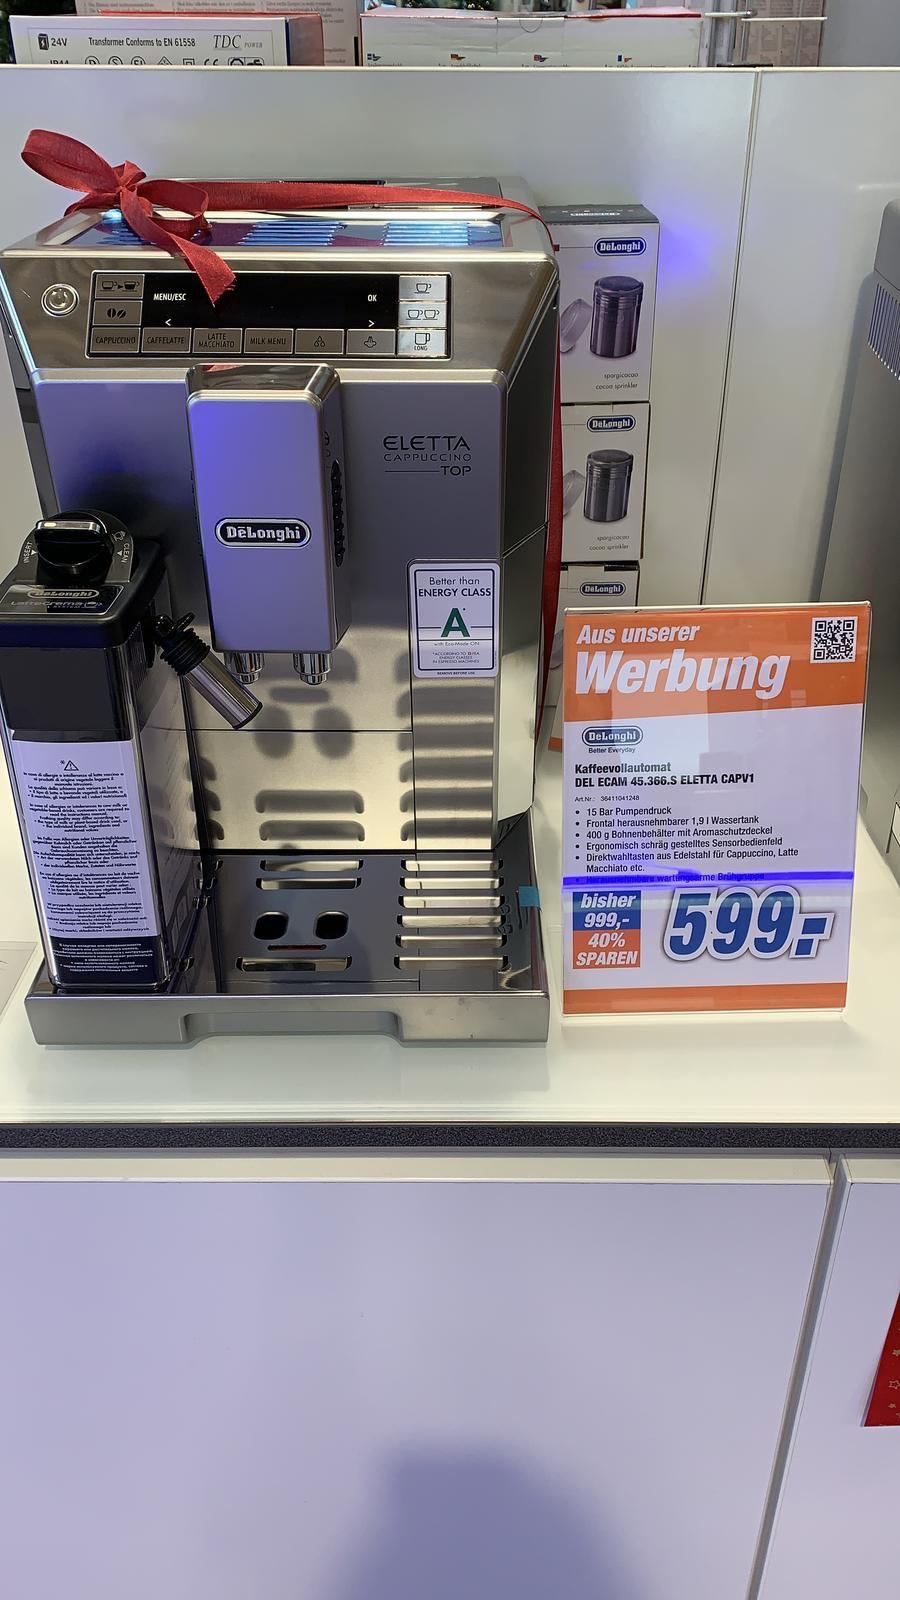 [LOKAL LEVERKUSEN] Expert DeLonghi Kaffeevollautomat ECAM 45.366.S Eletta CapV1 für 599 €